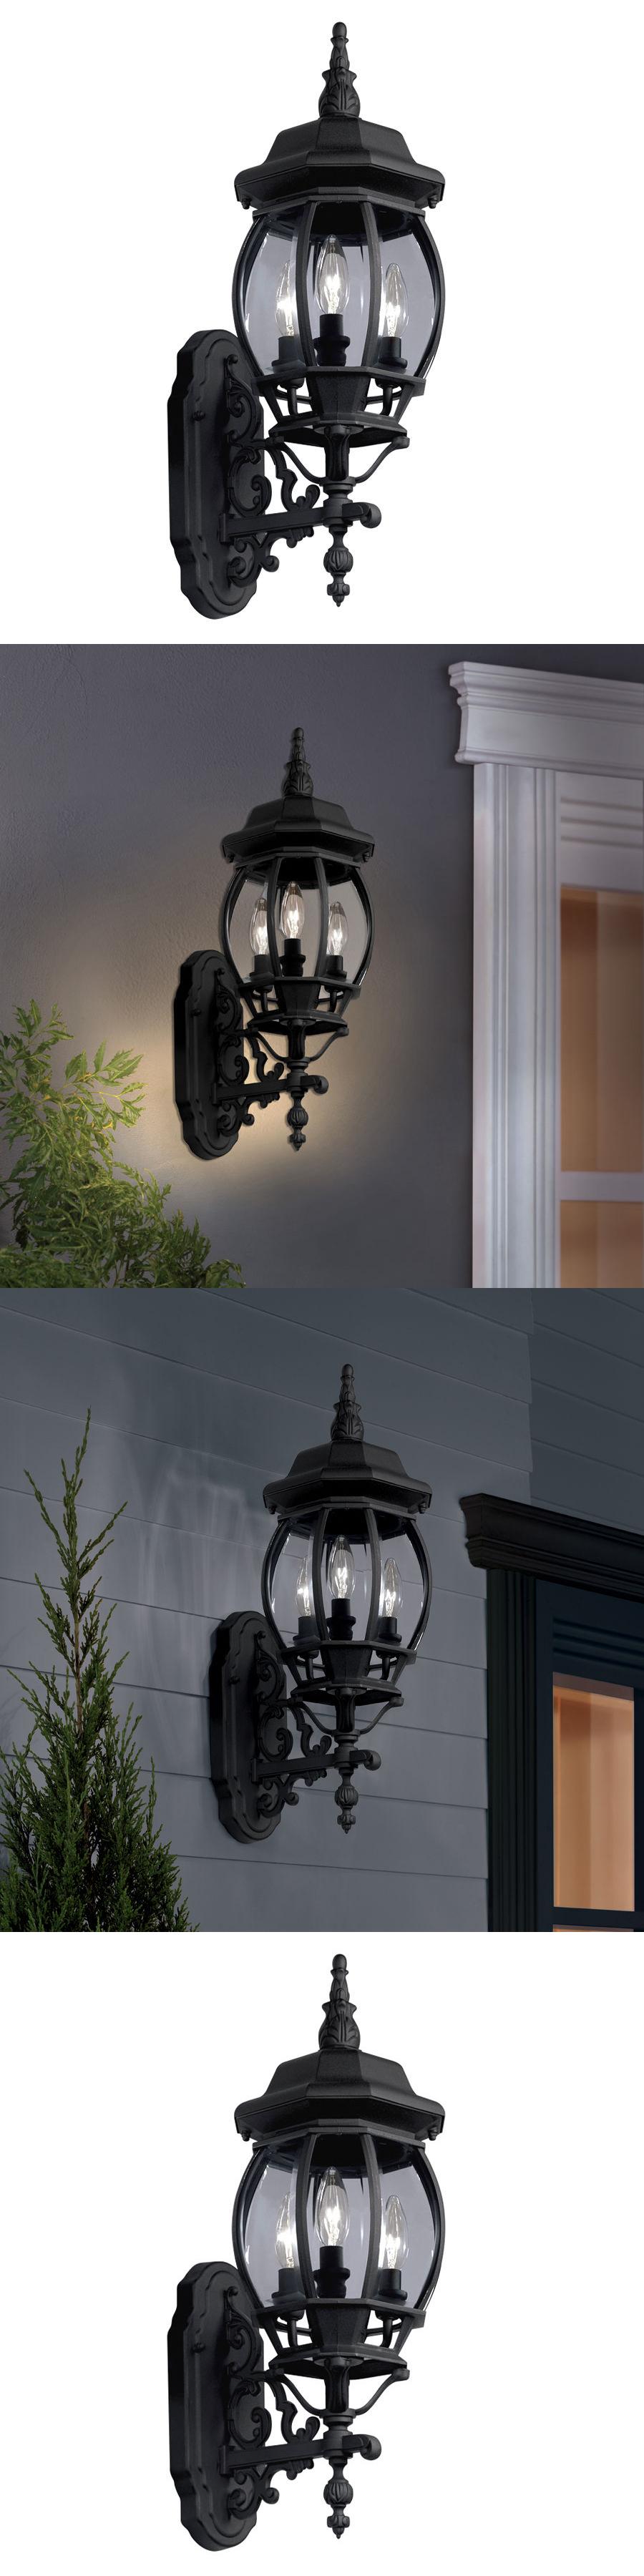 Outdoor Wall and Porch Lights 94939  Outdoor Lighting Exterior Wall Light  Lantern Fixture Sconce PorchOutdoor Wall and Porch Lights 94939  Black Outdoor Wall Mount  . Outdoor Patio Wall Lights. Home Design Ideas